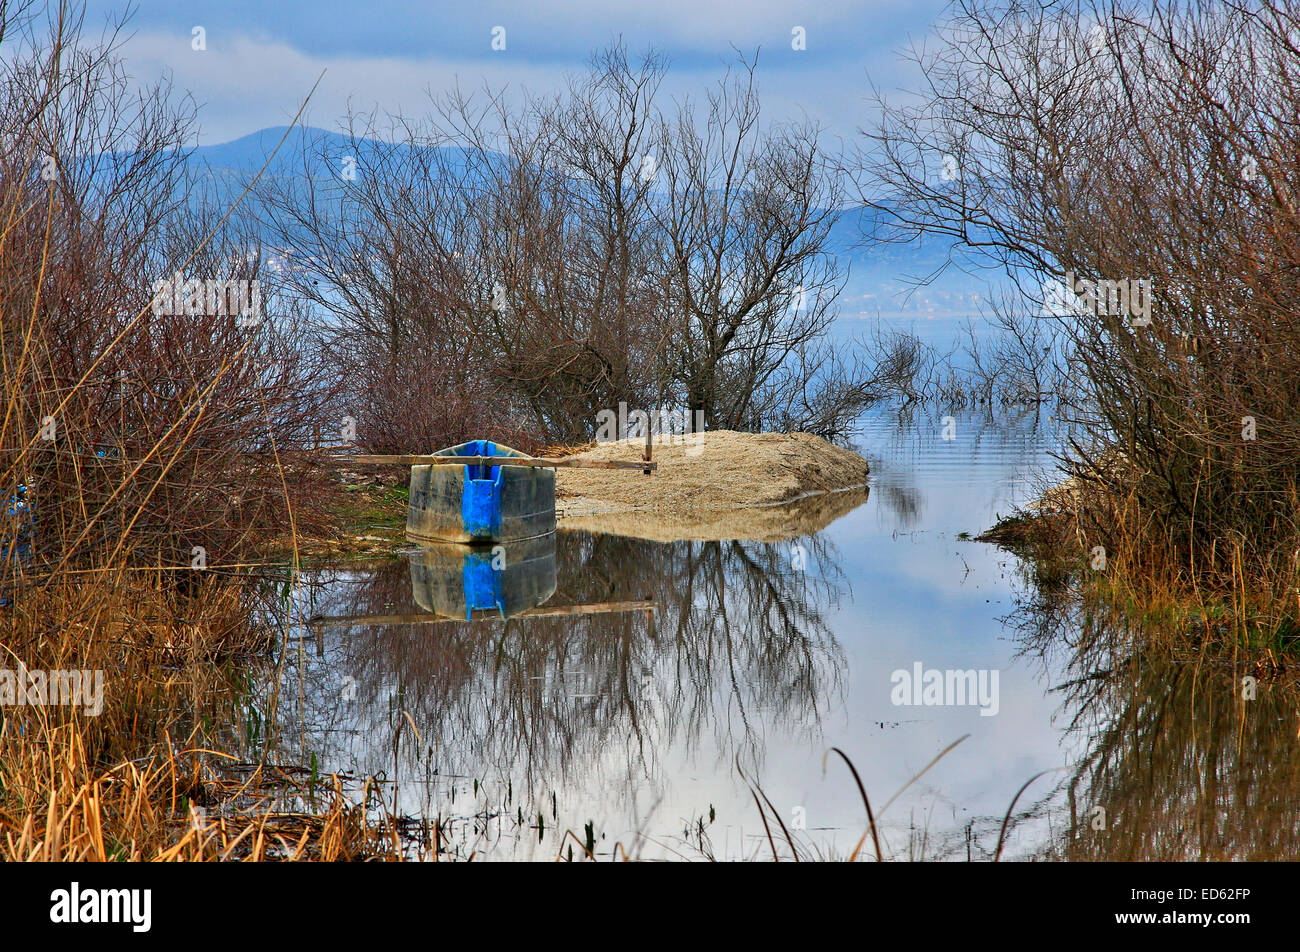 Lake Doirani, Kilkis prefecture, Macedonia, Greece - Stock Image